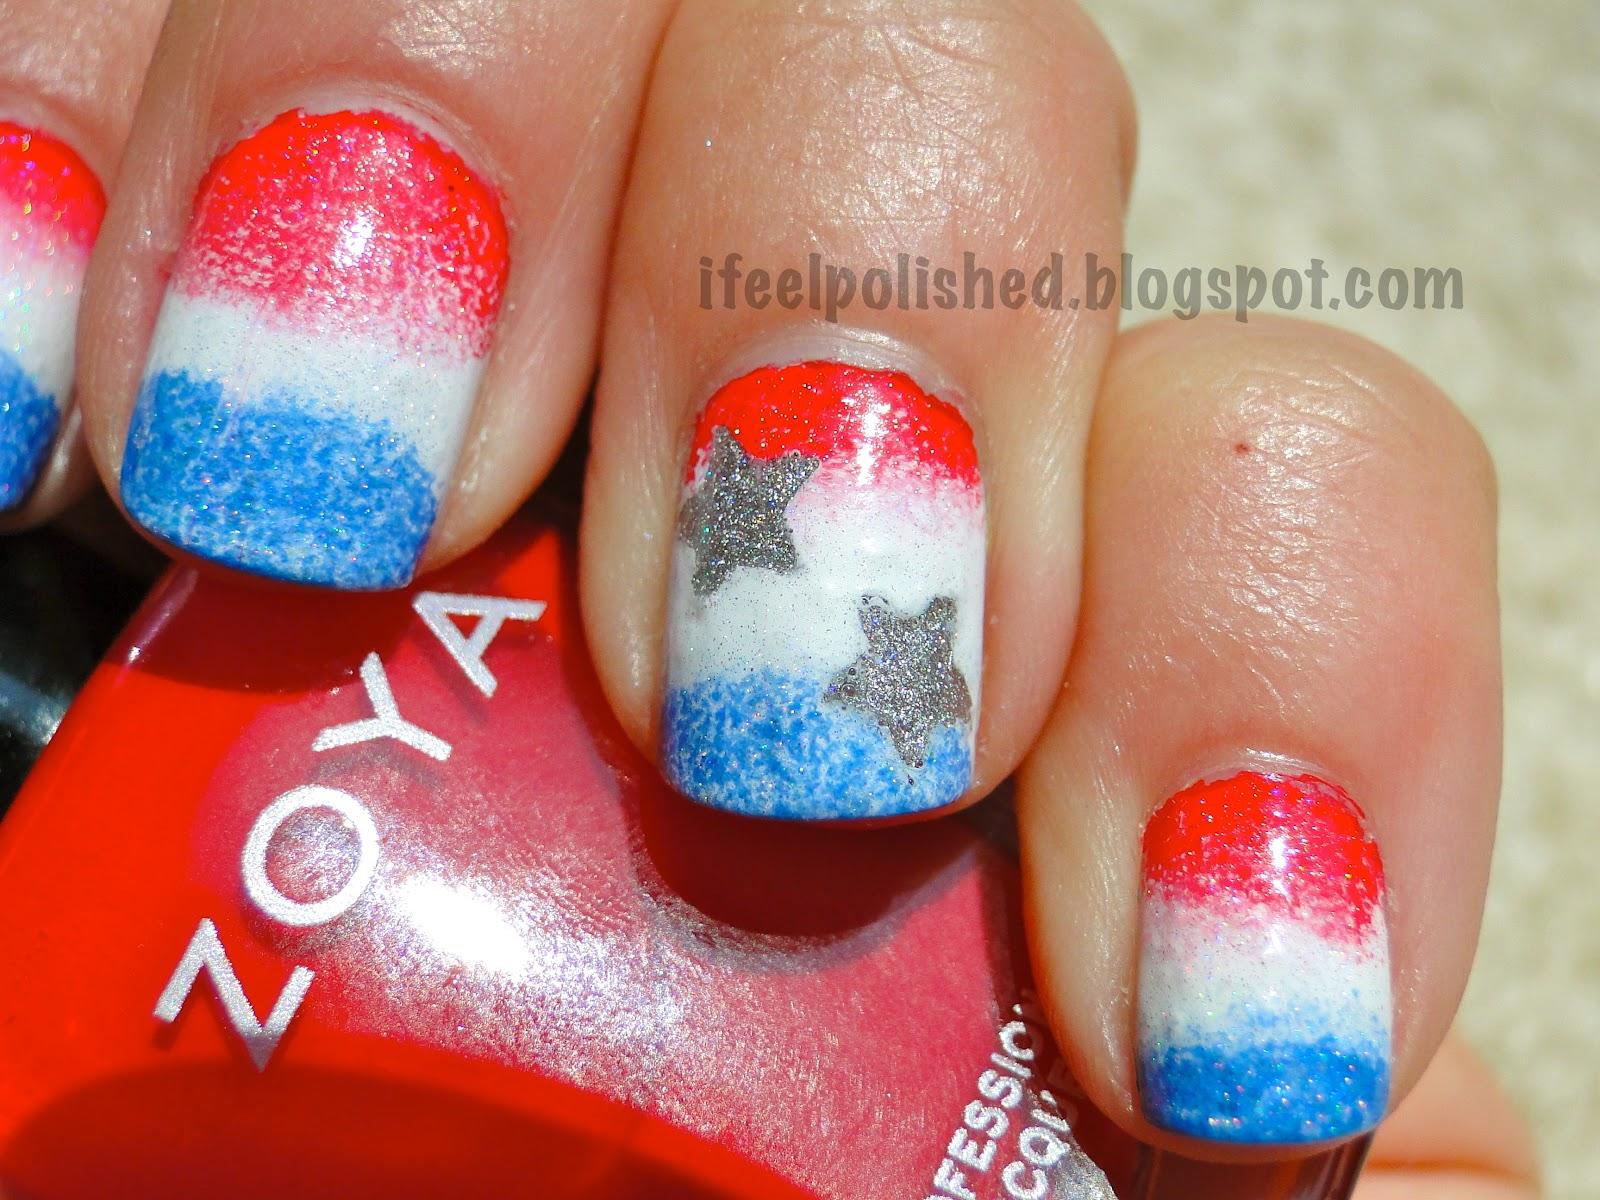 I Feel Polished!: 4th of July Nails!